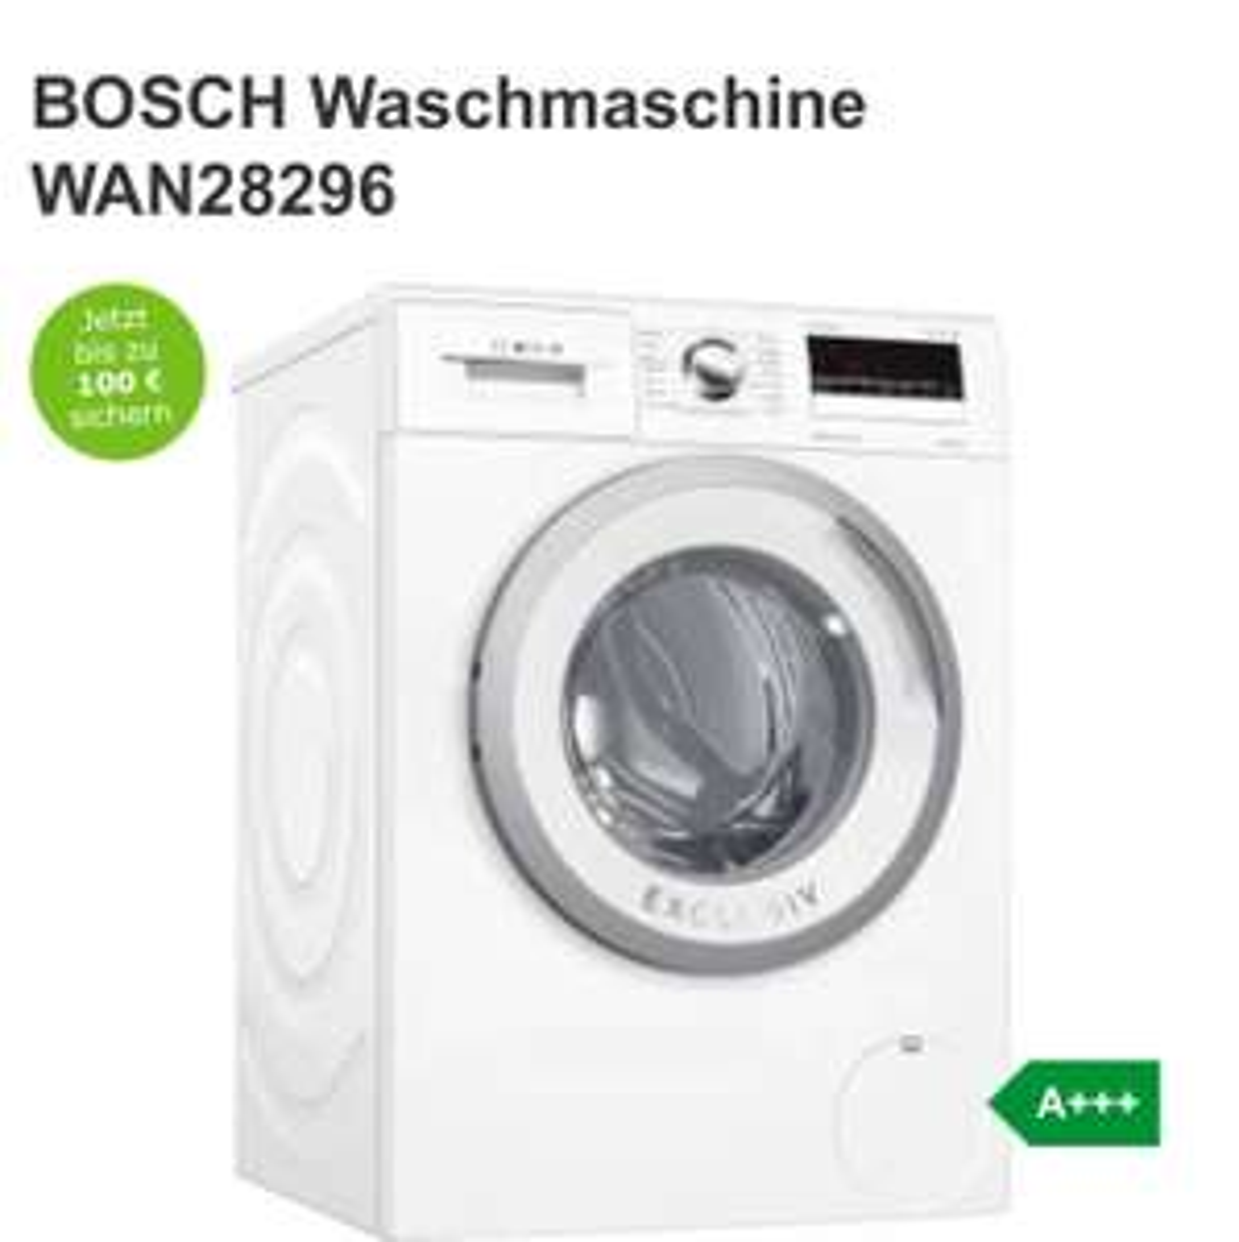 BOSCH Waschmaschine WAN28296 399€ mit 50€ Cashback [Expert Bundesweit]